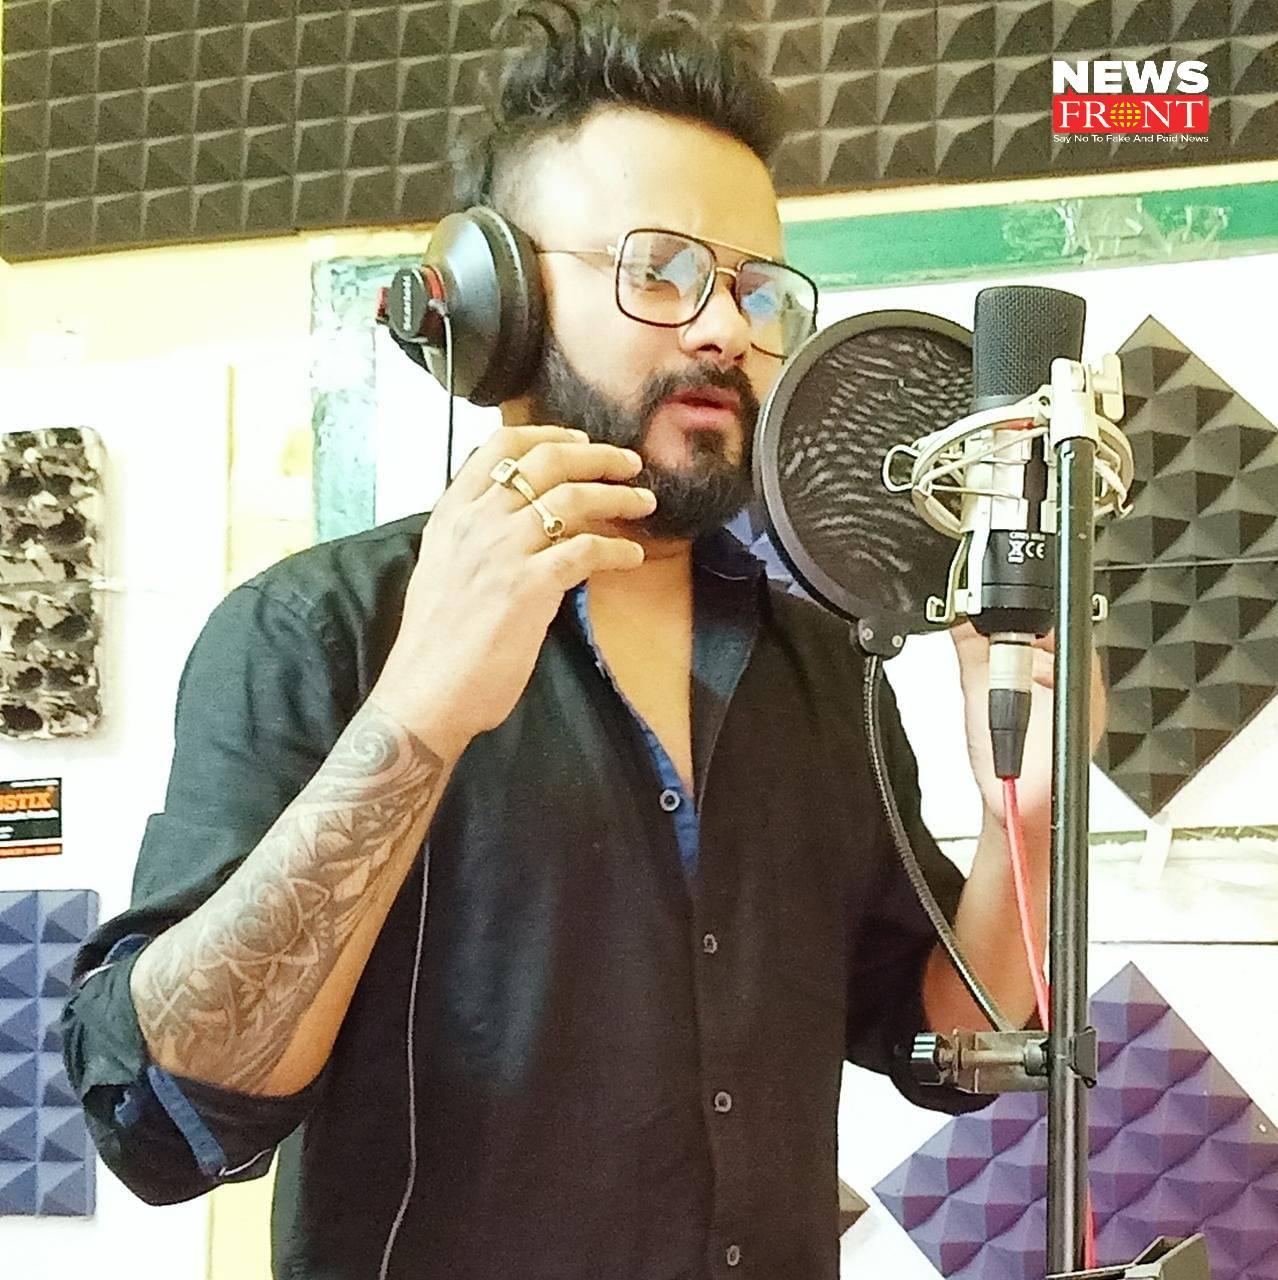 singer | newsfront.co